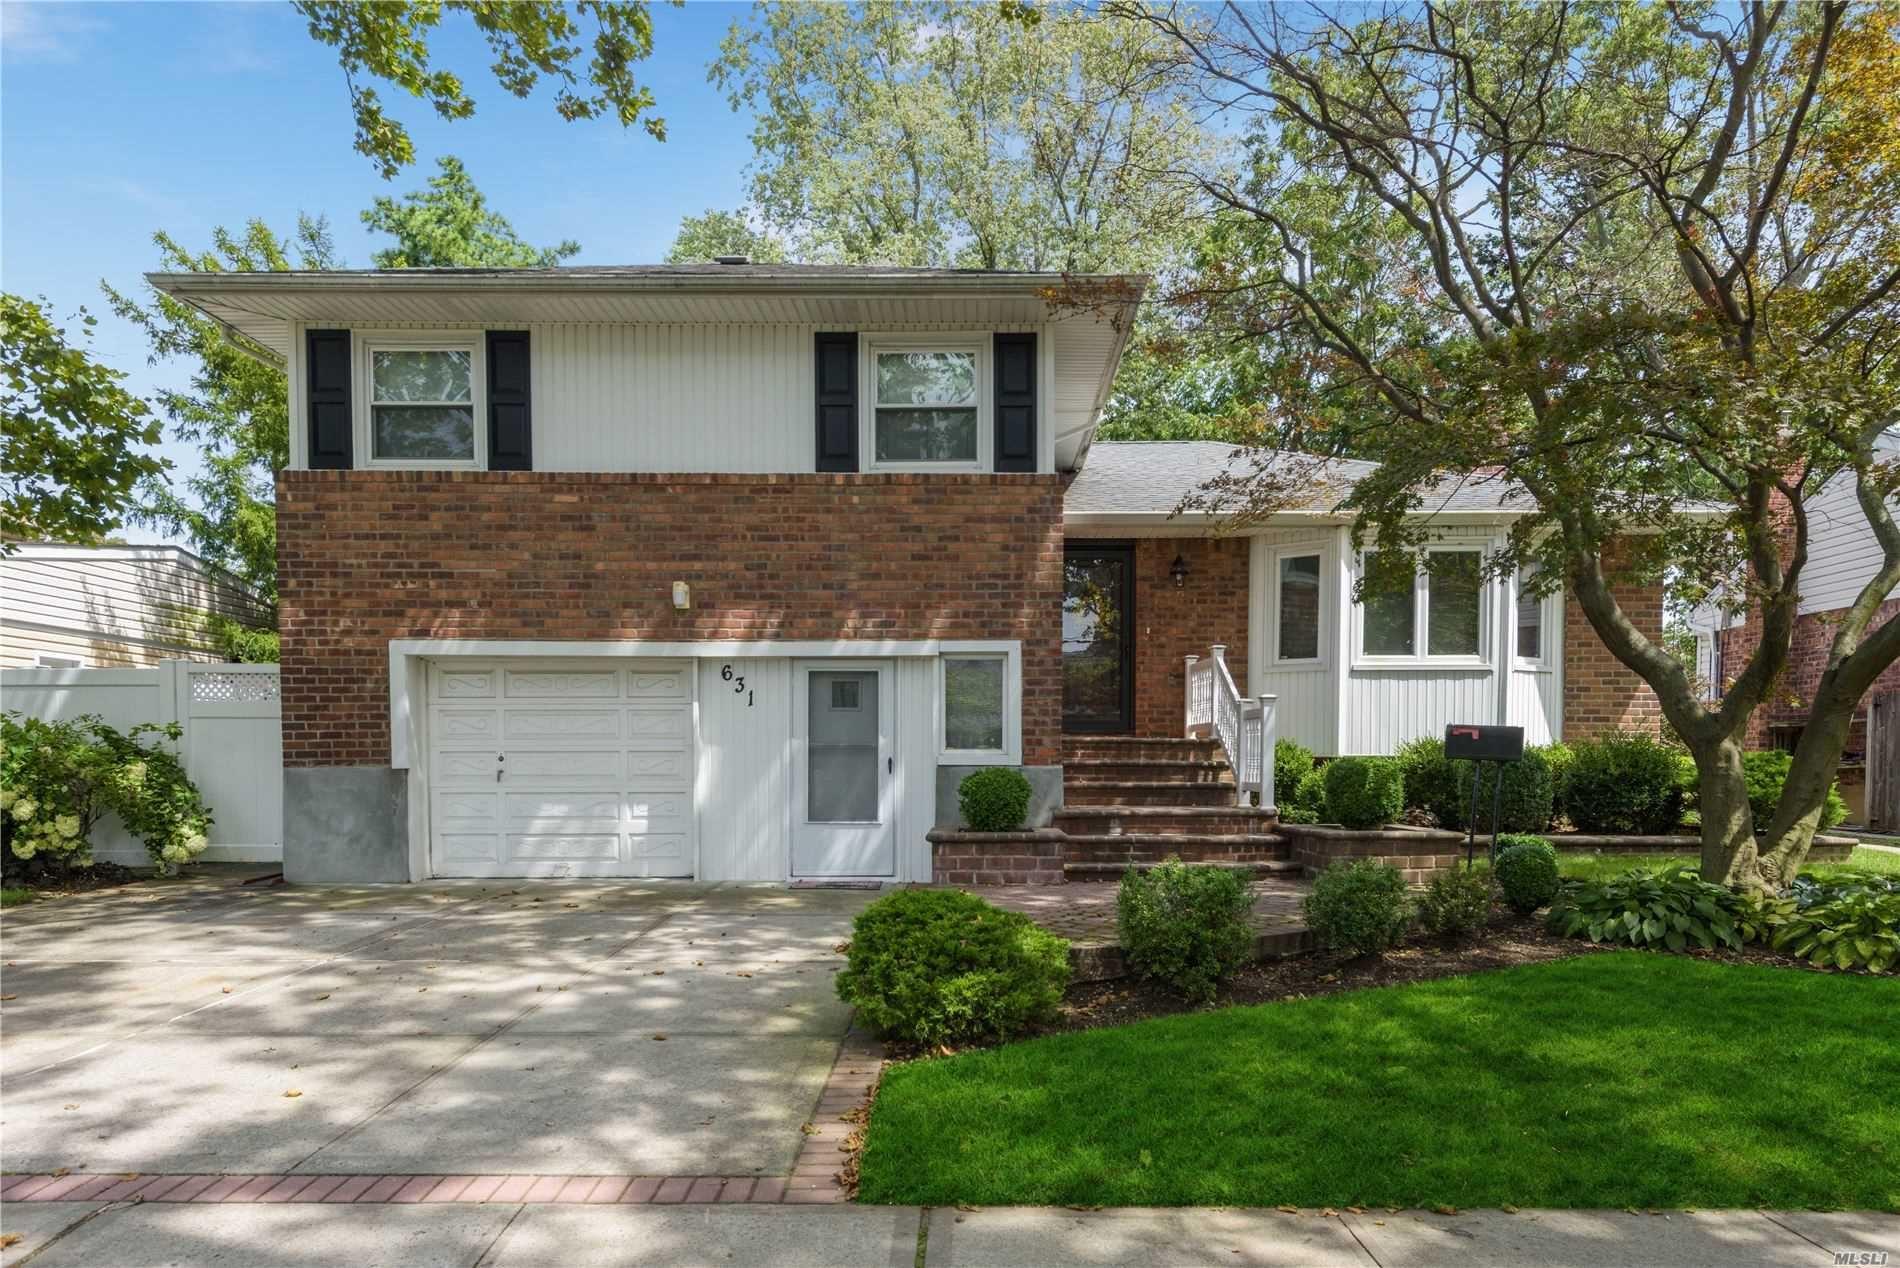 631 Bellmore Avenue, East Meadow, NY 11554 - MLS#: 3244583